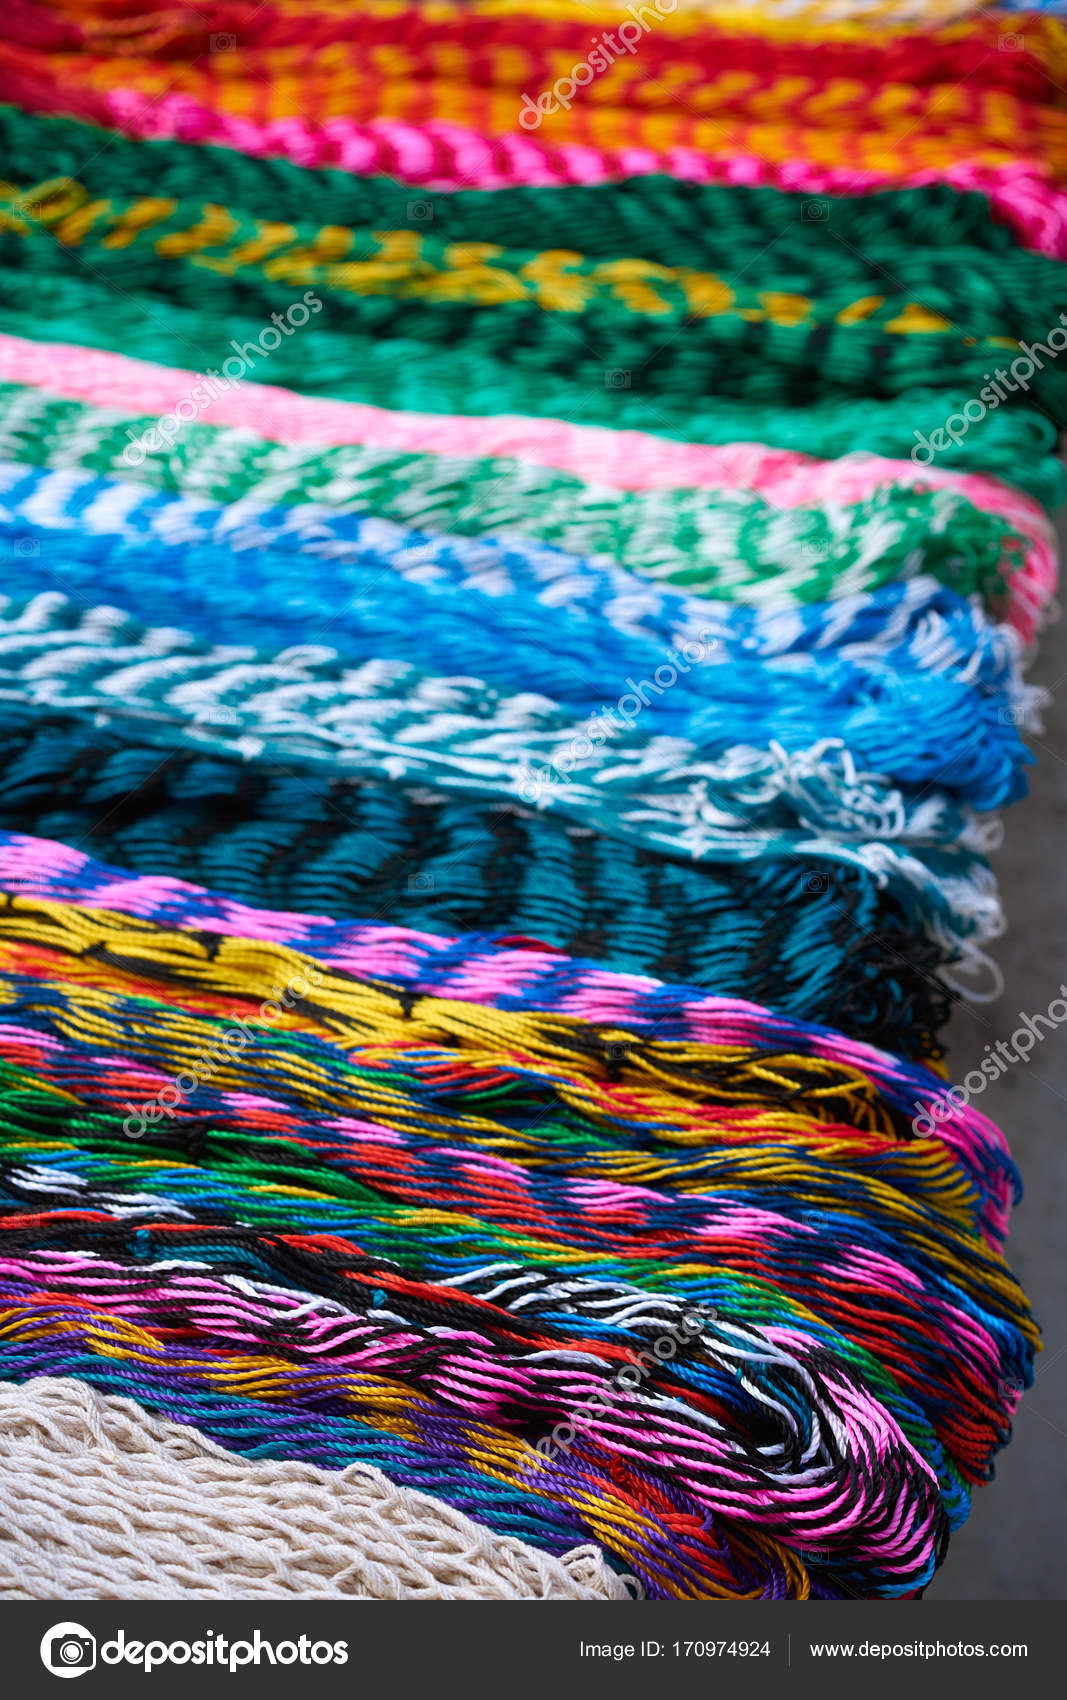 chichen itza colorful hammocks in mexico  u2014 stock photo chichen itza colorful hammocks in mexico  u2014 stock photo      rh   depositphotos